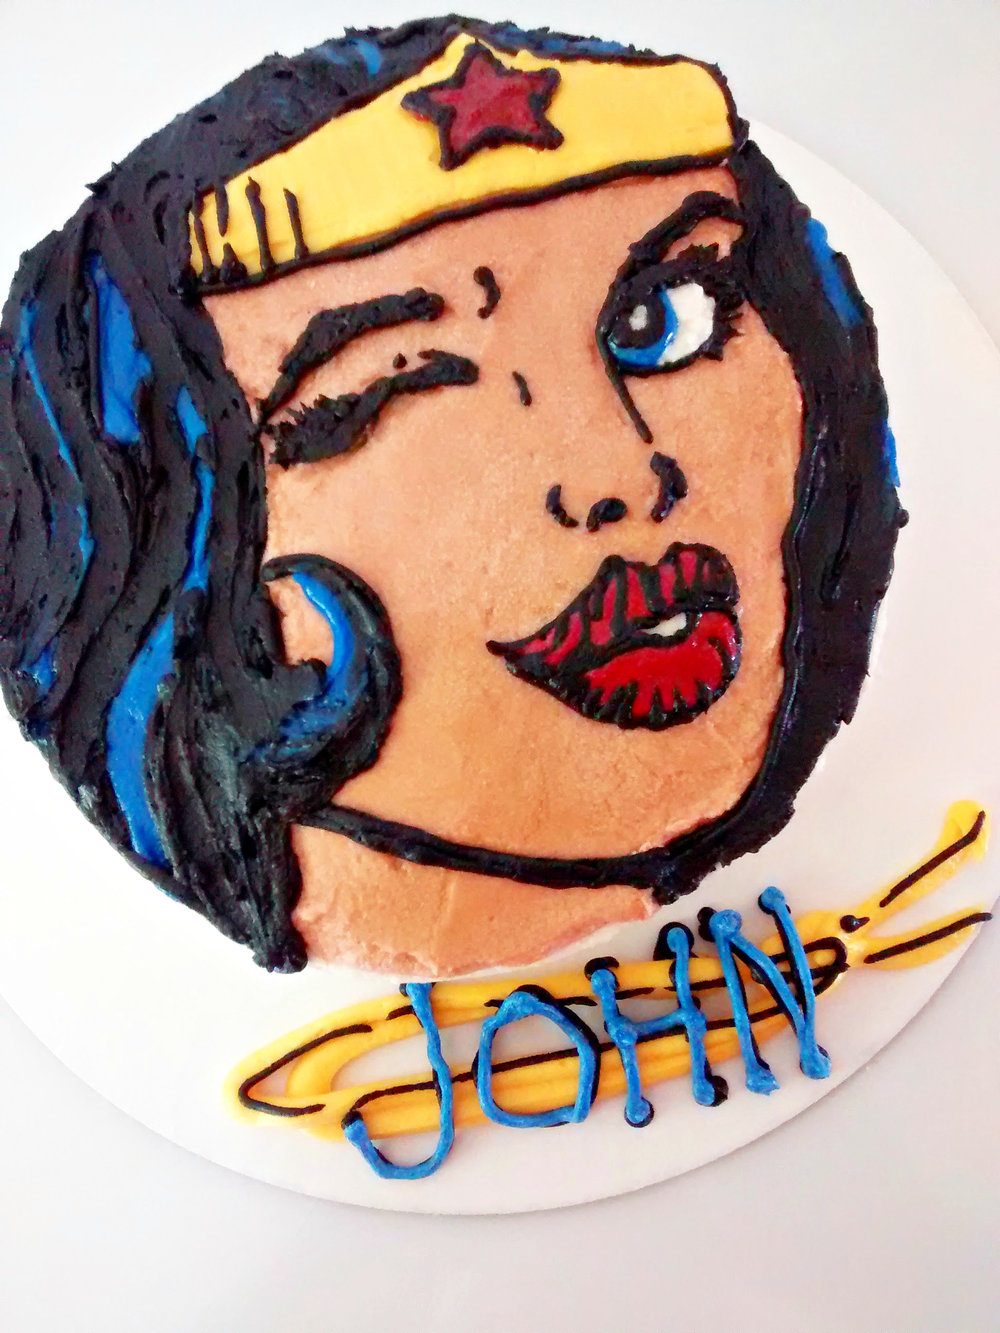 Wonder Woman Cake 2.jpg